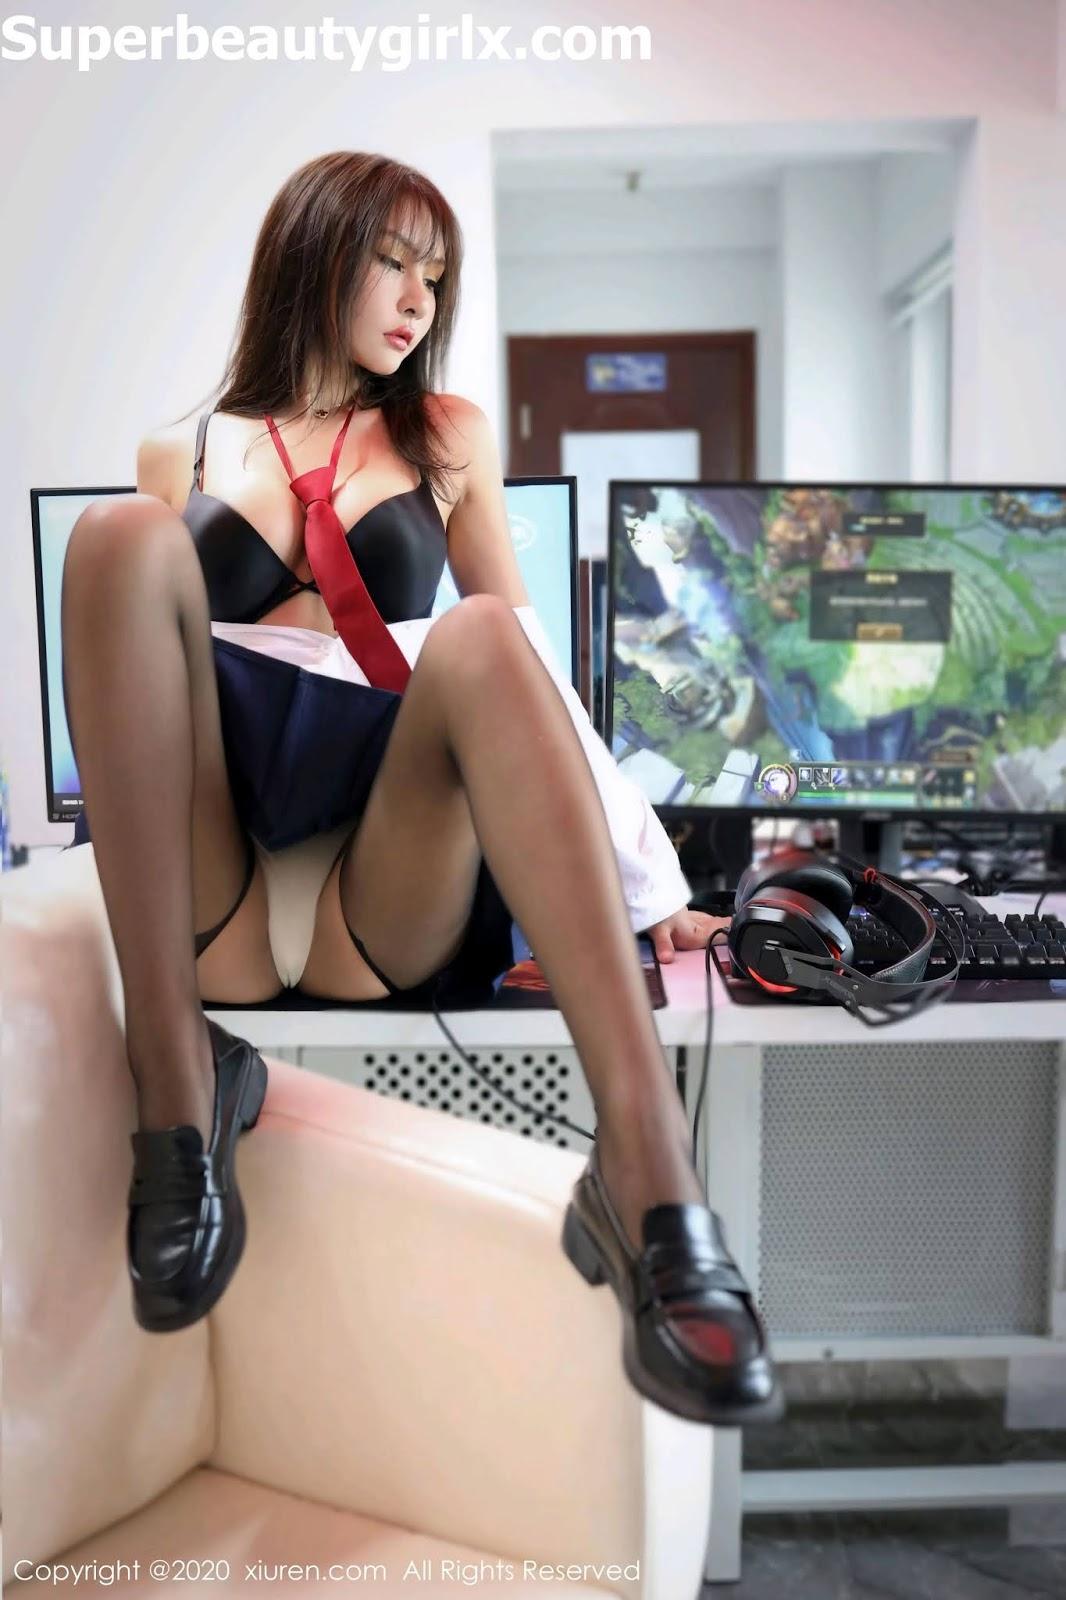 XIUREN-No.2461-Emily-Superbeautygirlx.com